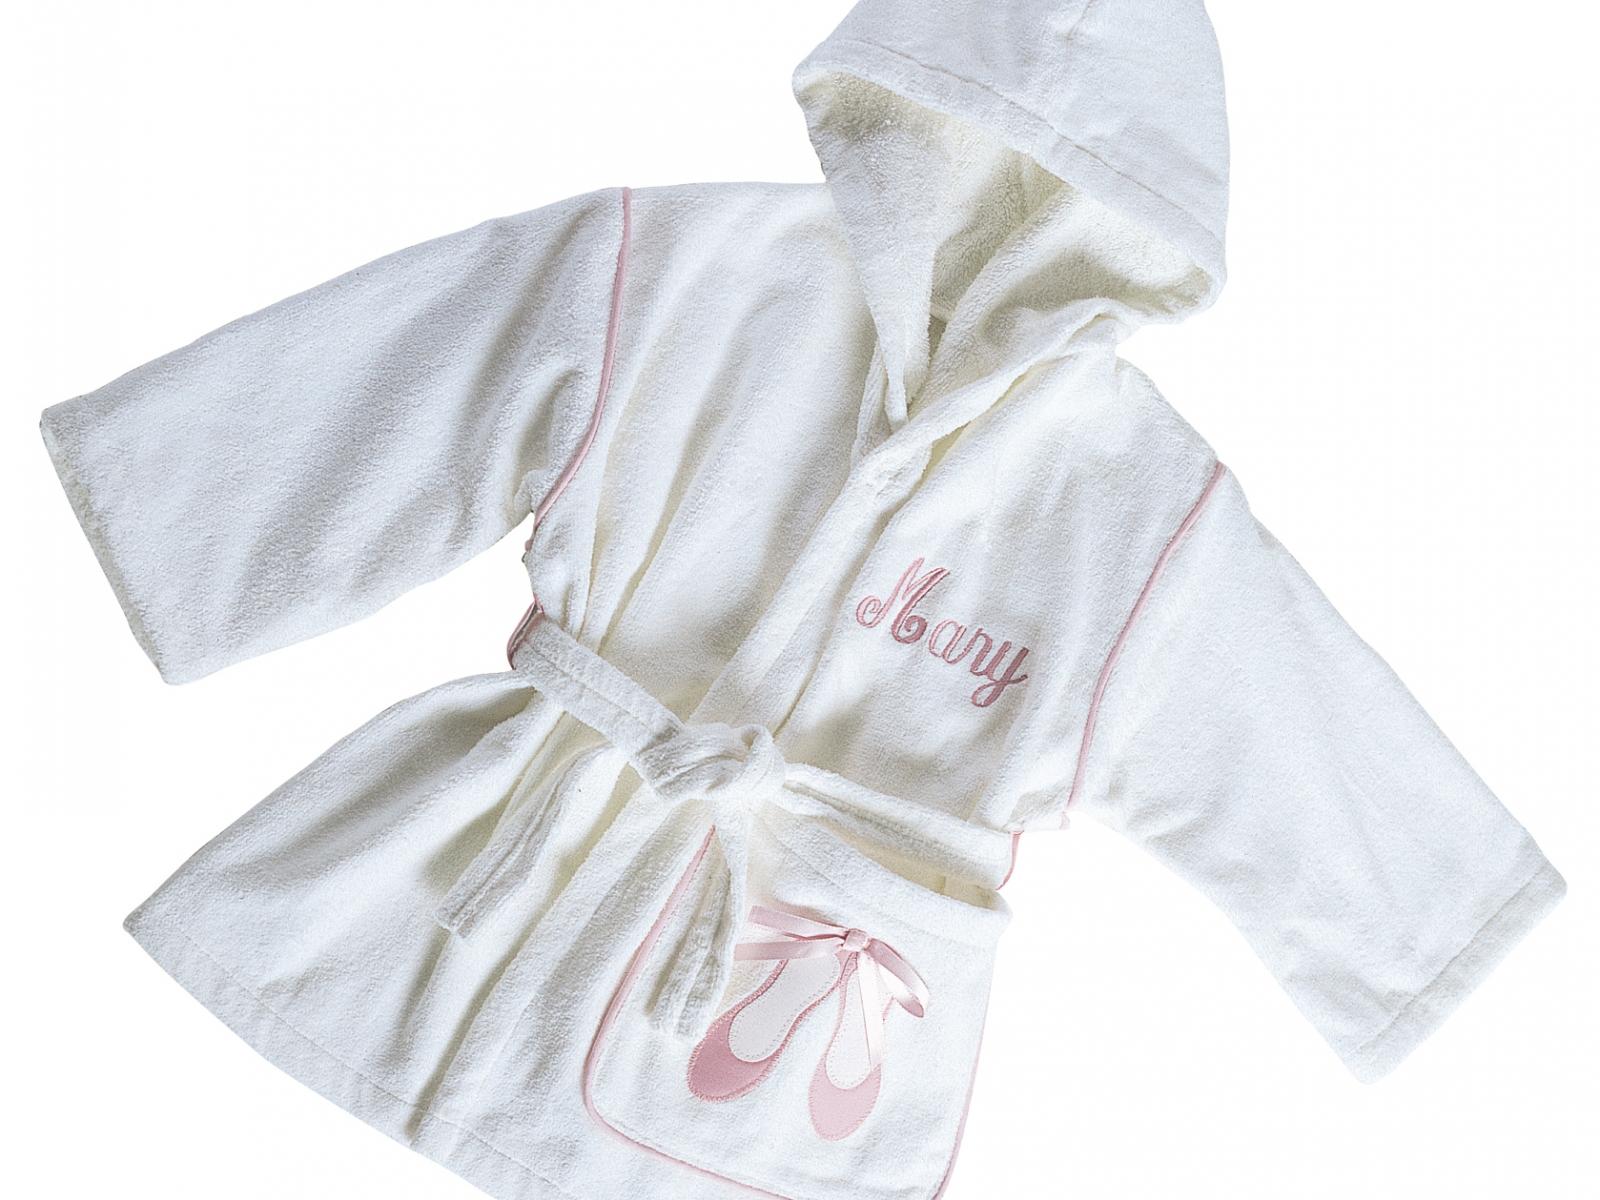 cc066adc40 Jack and Jill Baby Robes - Luxury Bath Robes - Luxury Bath Linen ...